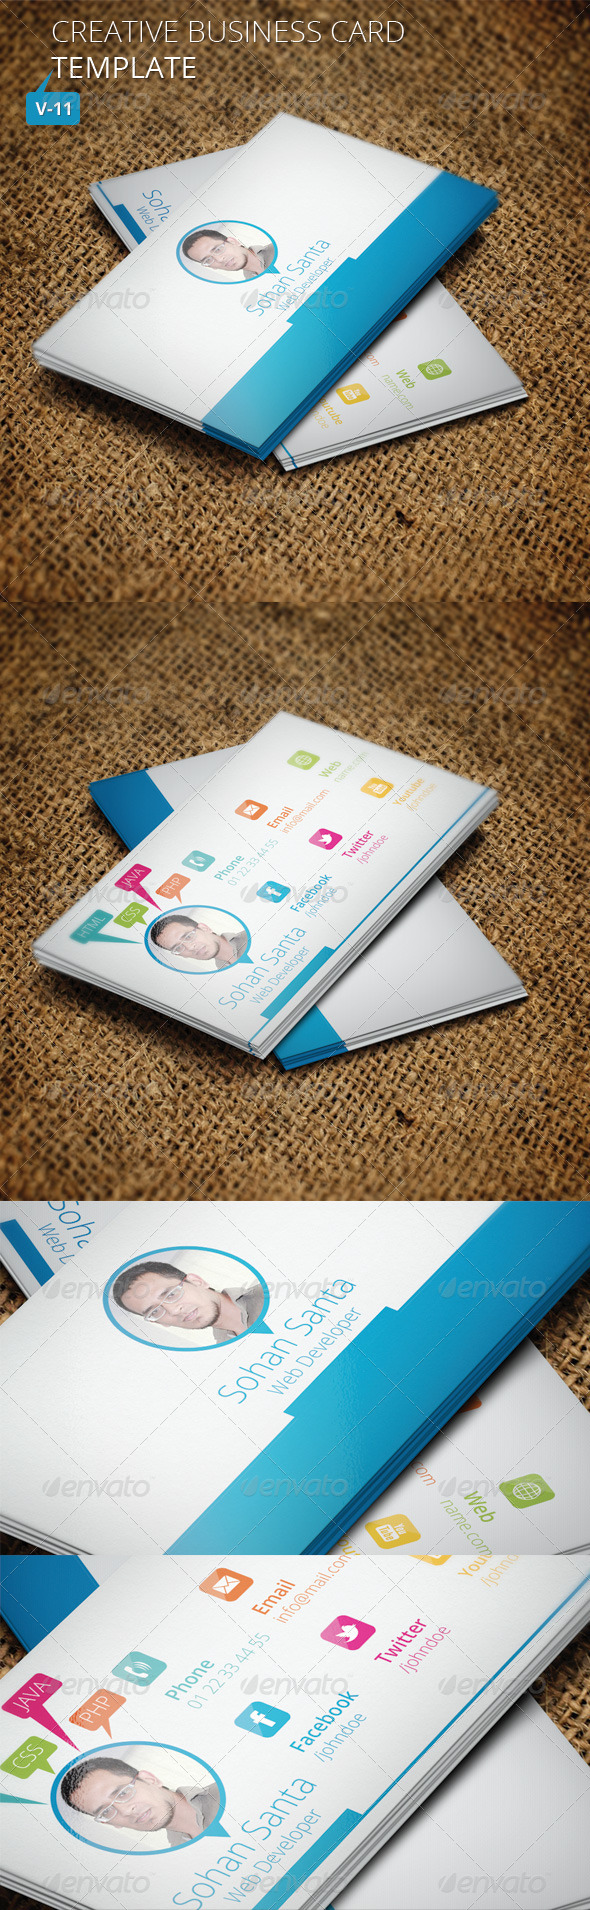 Creative Business Card V 11 - Creative Business Cards